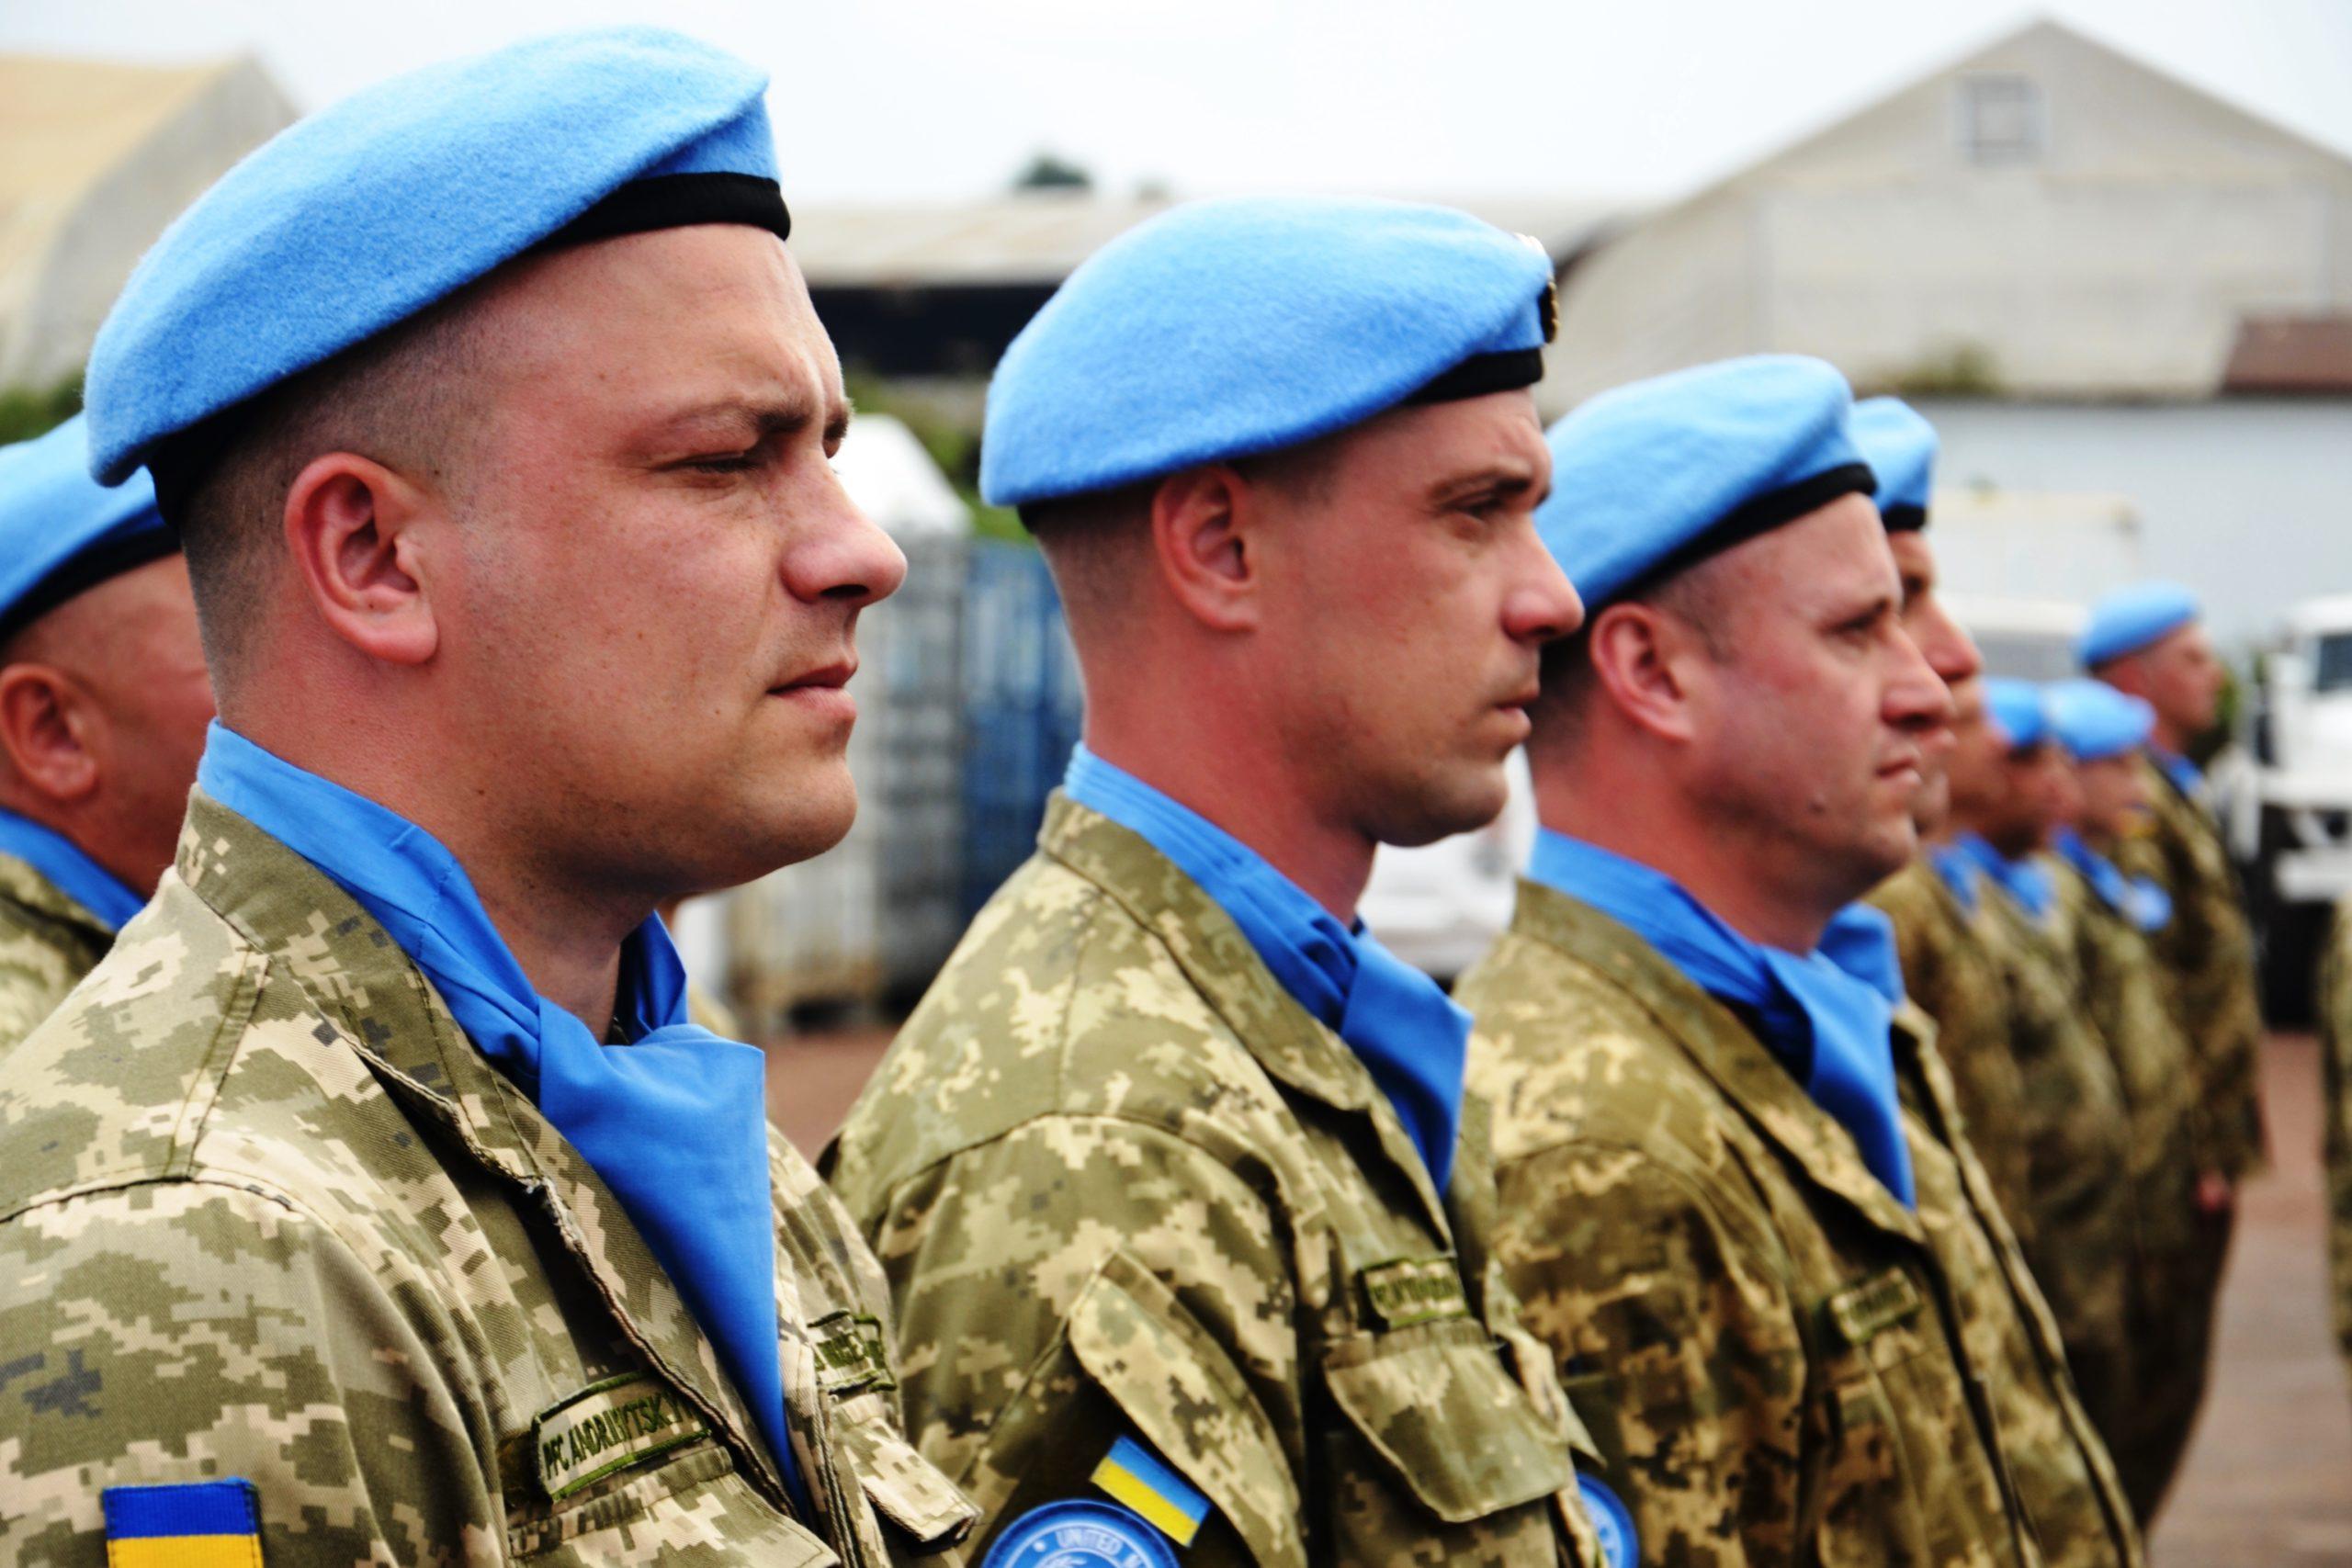 Ukrainian_aviation_unit._DR_Congo._MONUSCO_Ukrainian_aviation_unit._DR_Congo._MONUSCO_(38059446611)